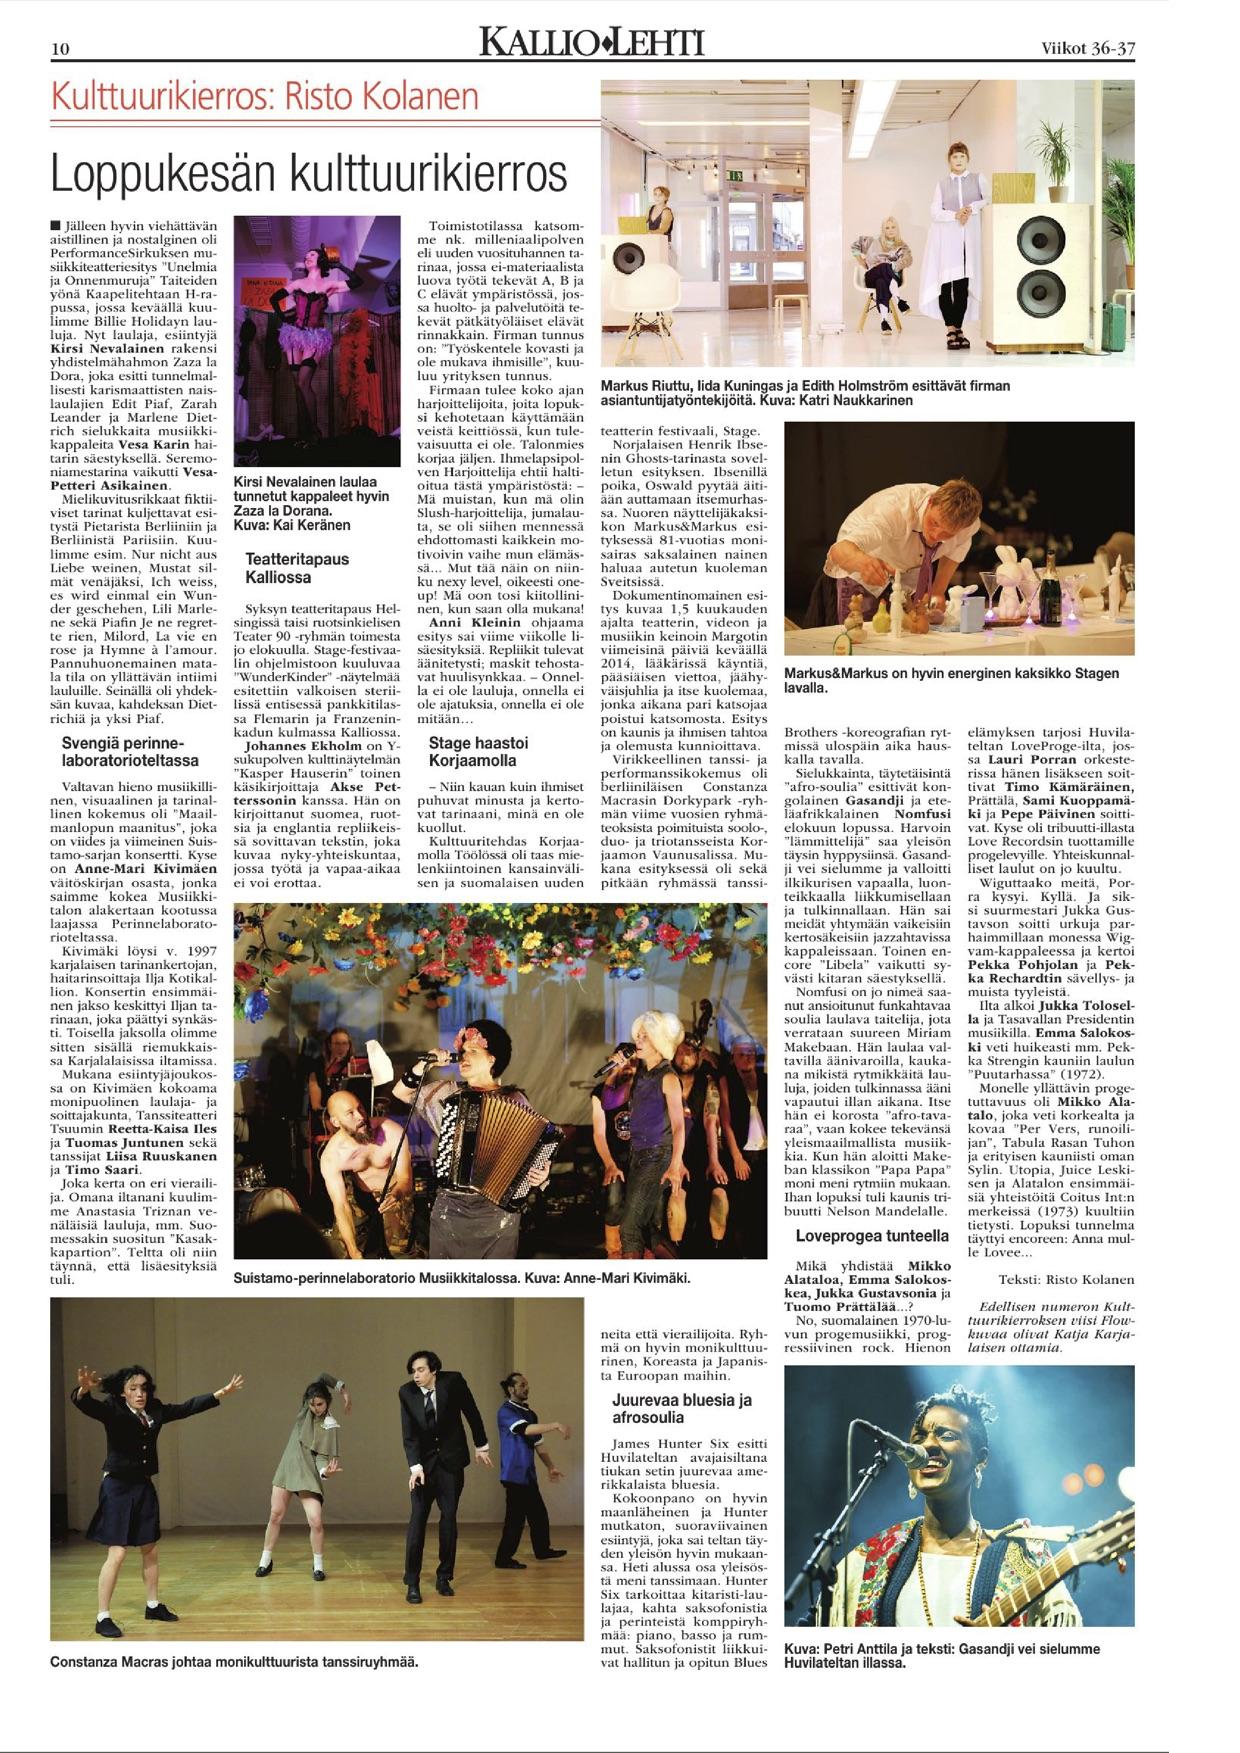 Kallio-lehti 07.09.2016- Perinnelaboratorio